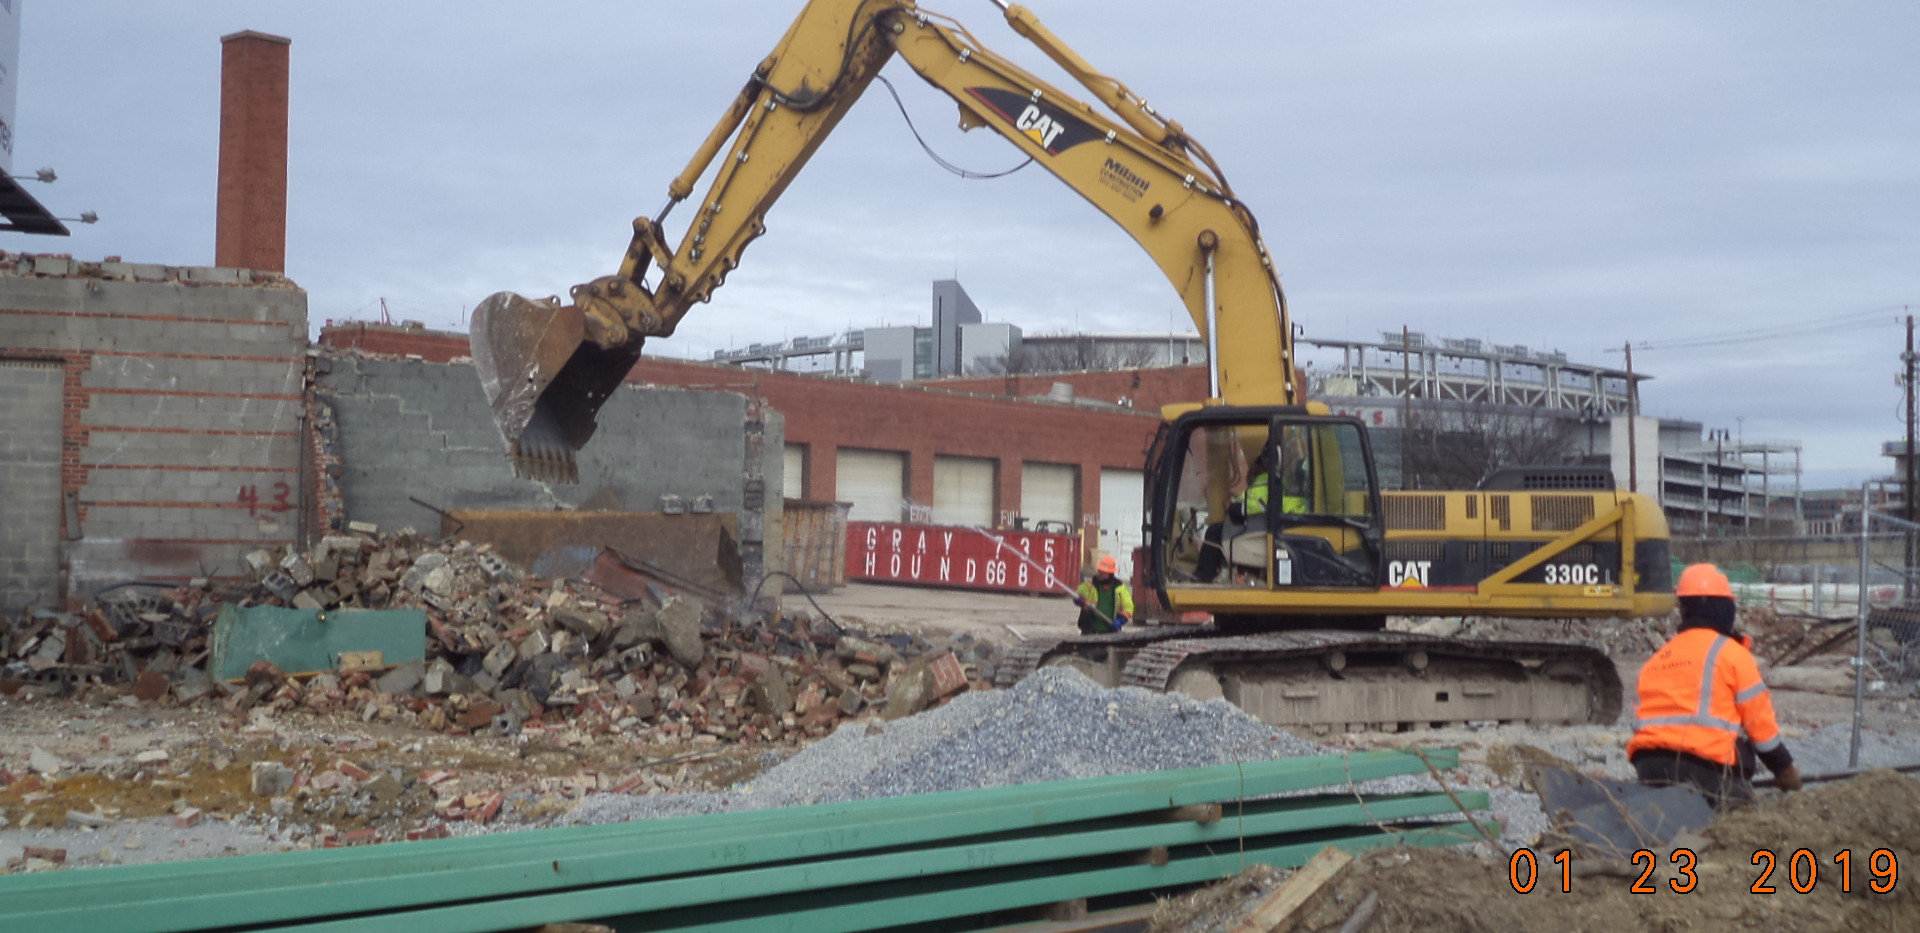 Demolition existing building 1601